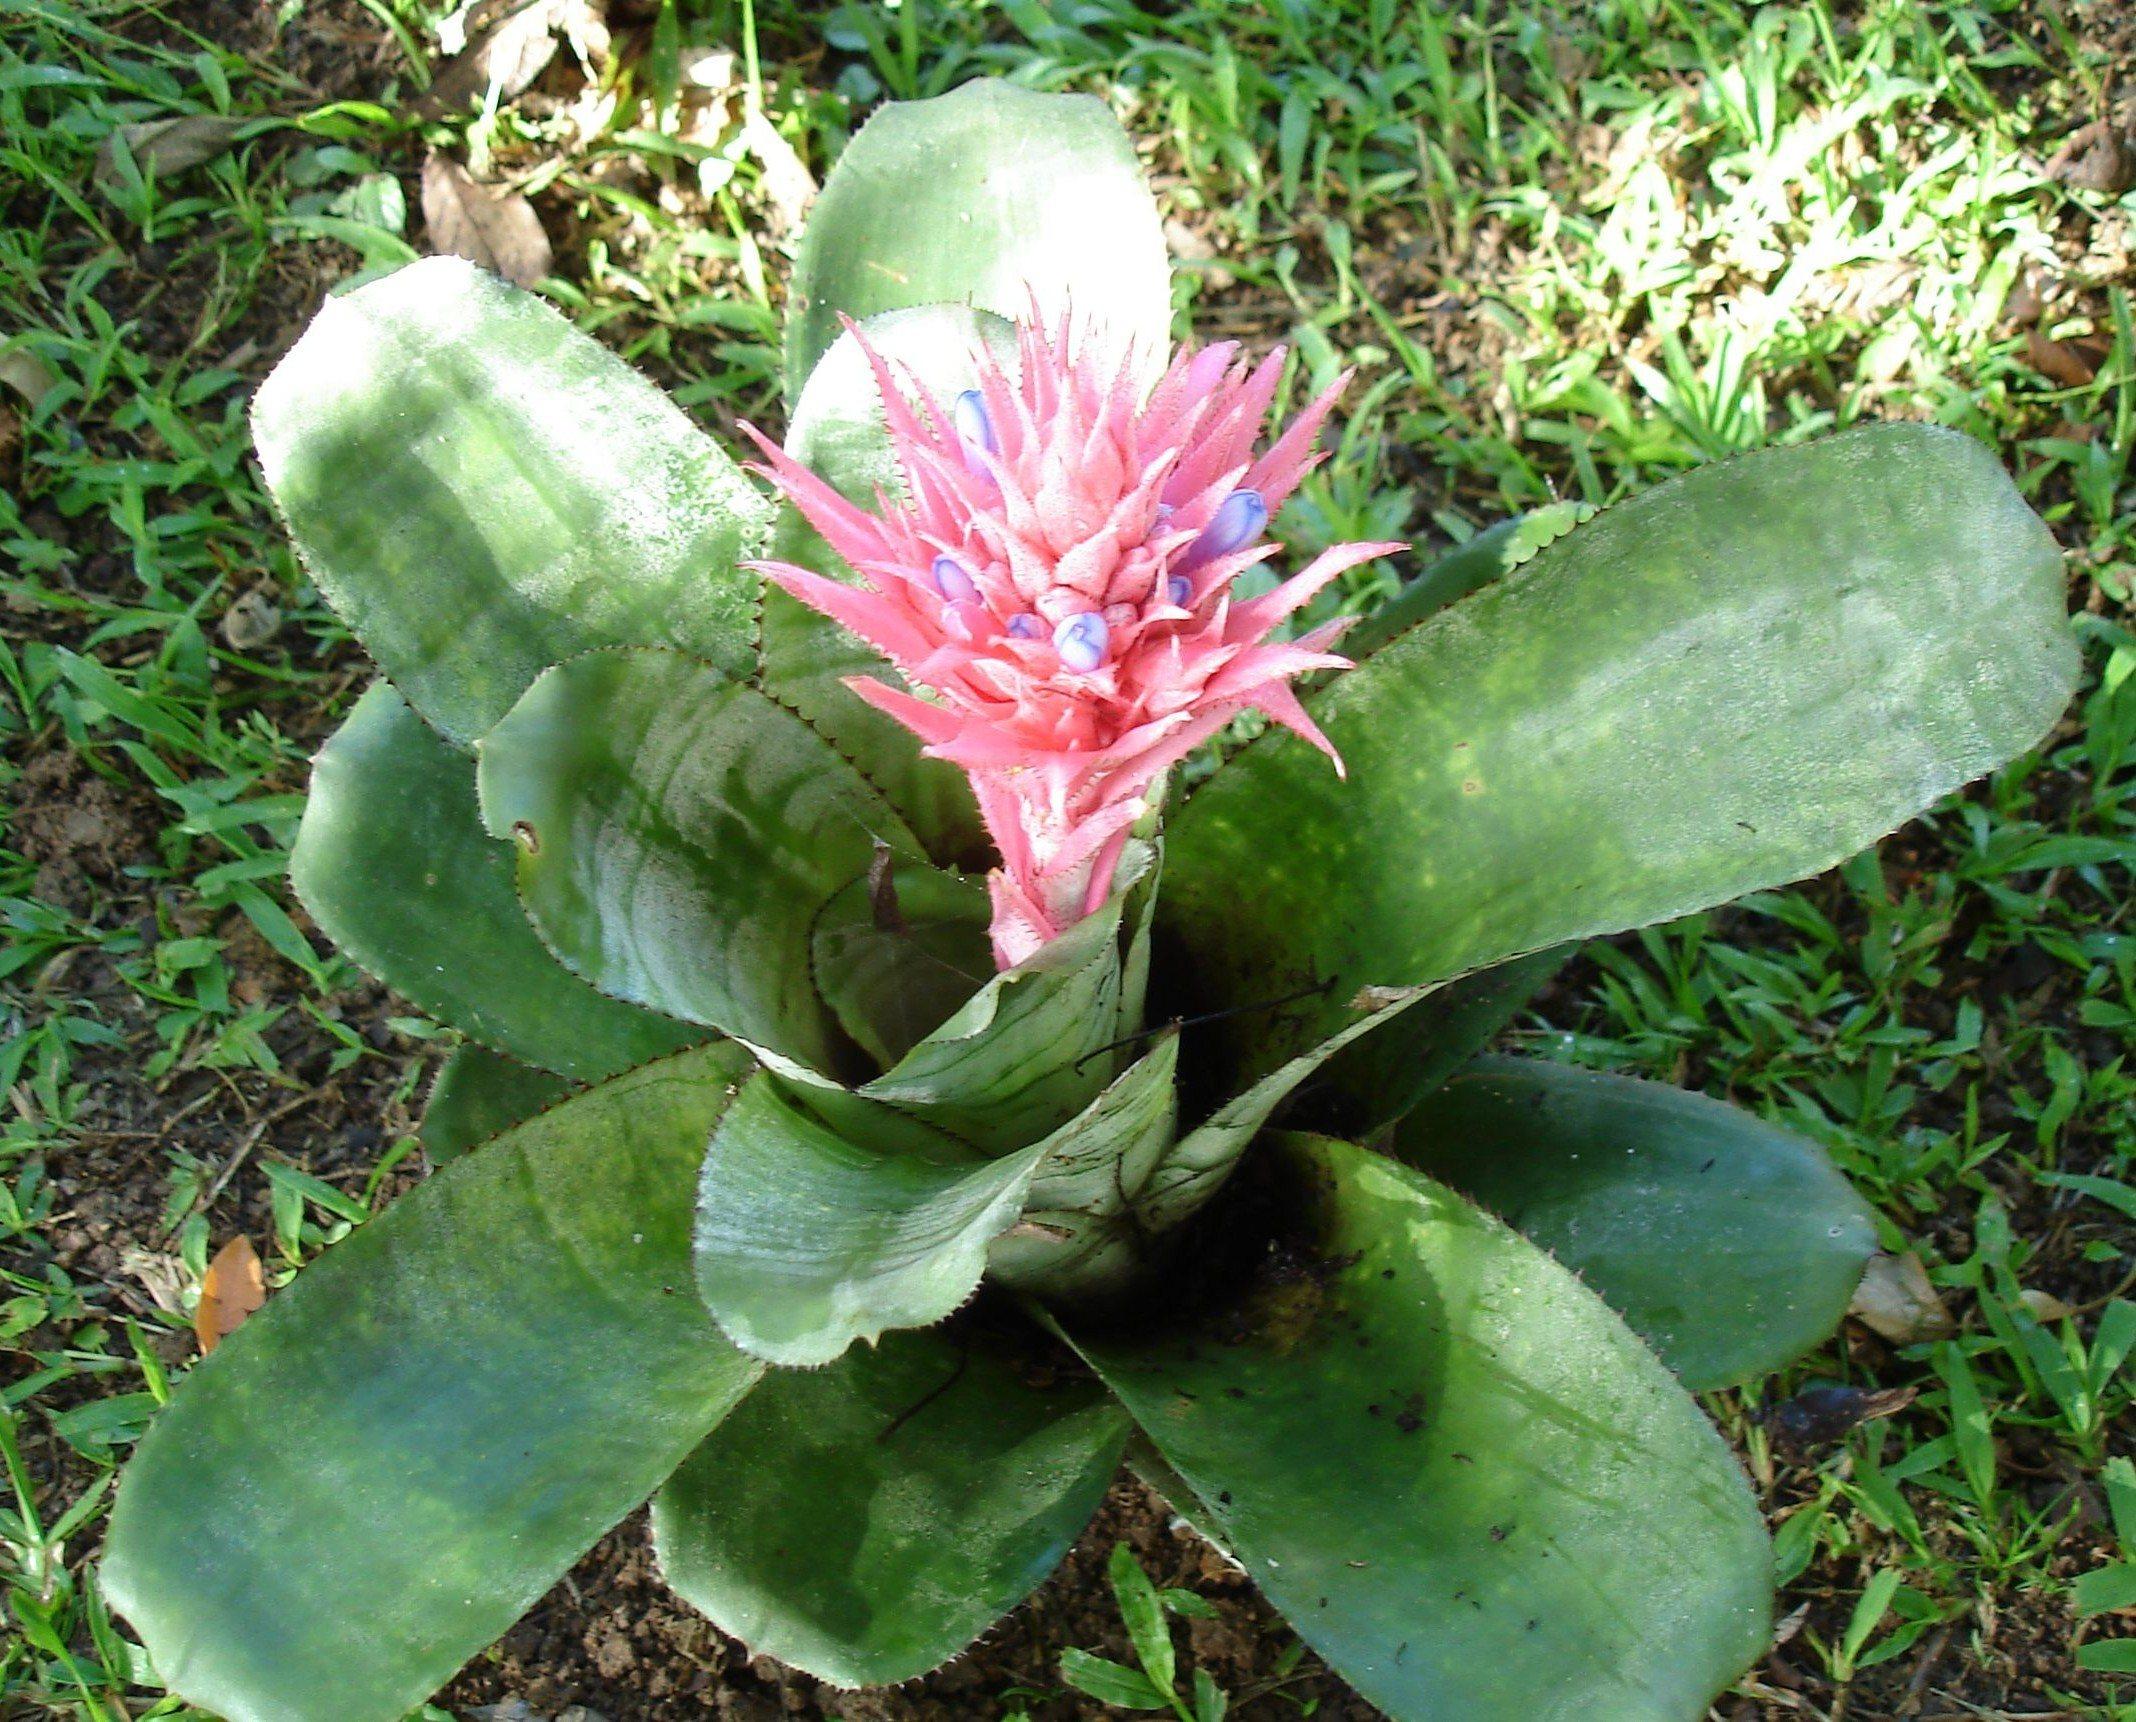 Universo das flores, https://universodasflores.wordpress.com/2013/03/21/page/3/